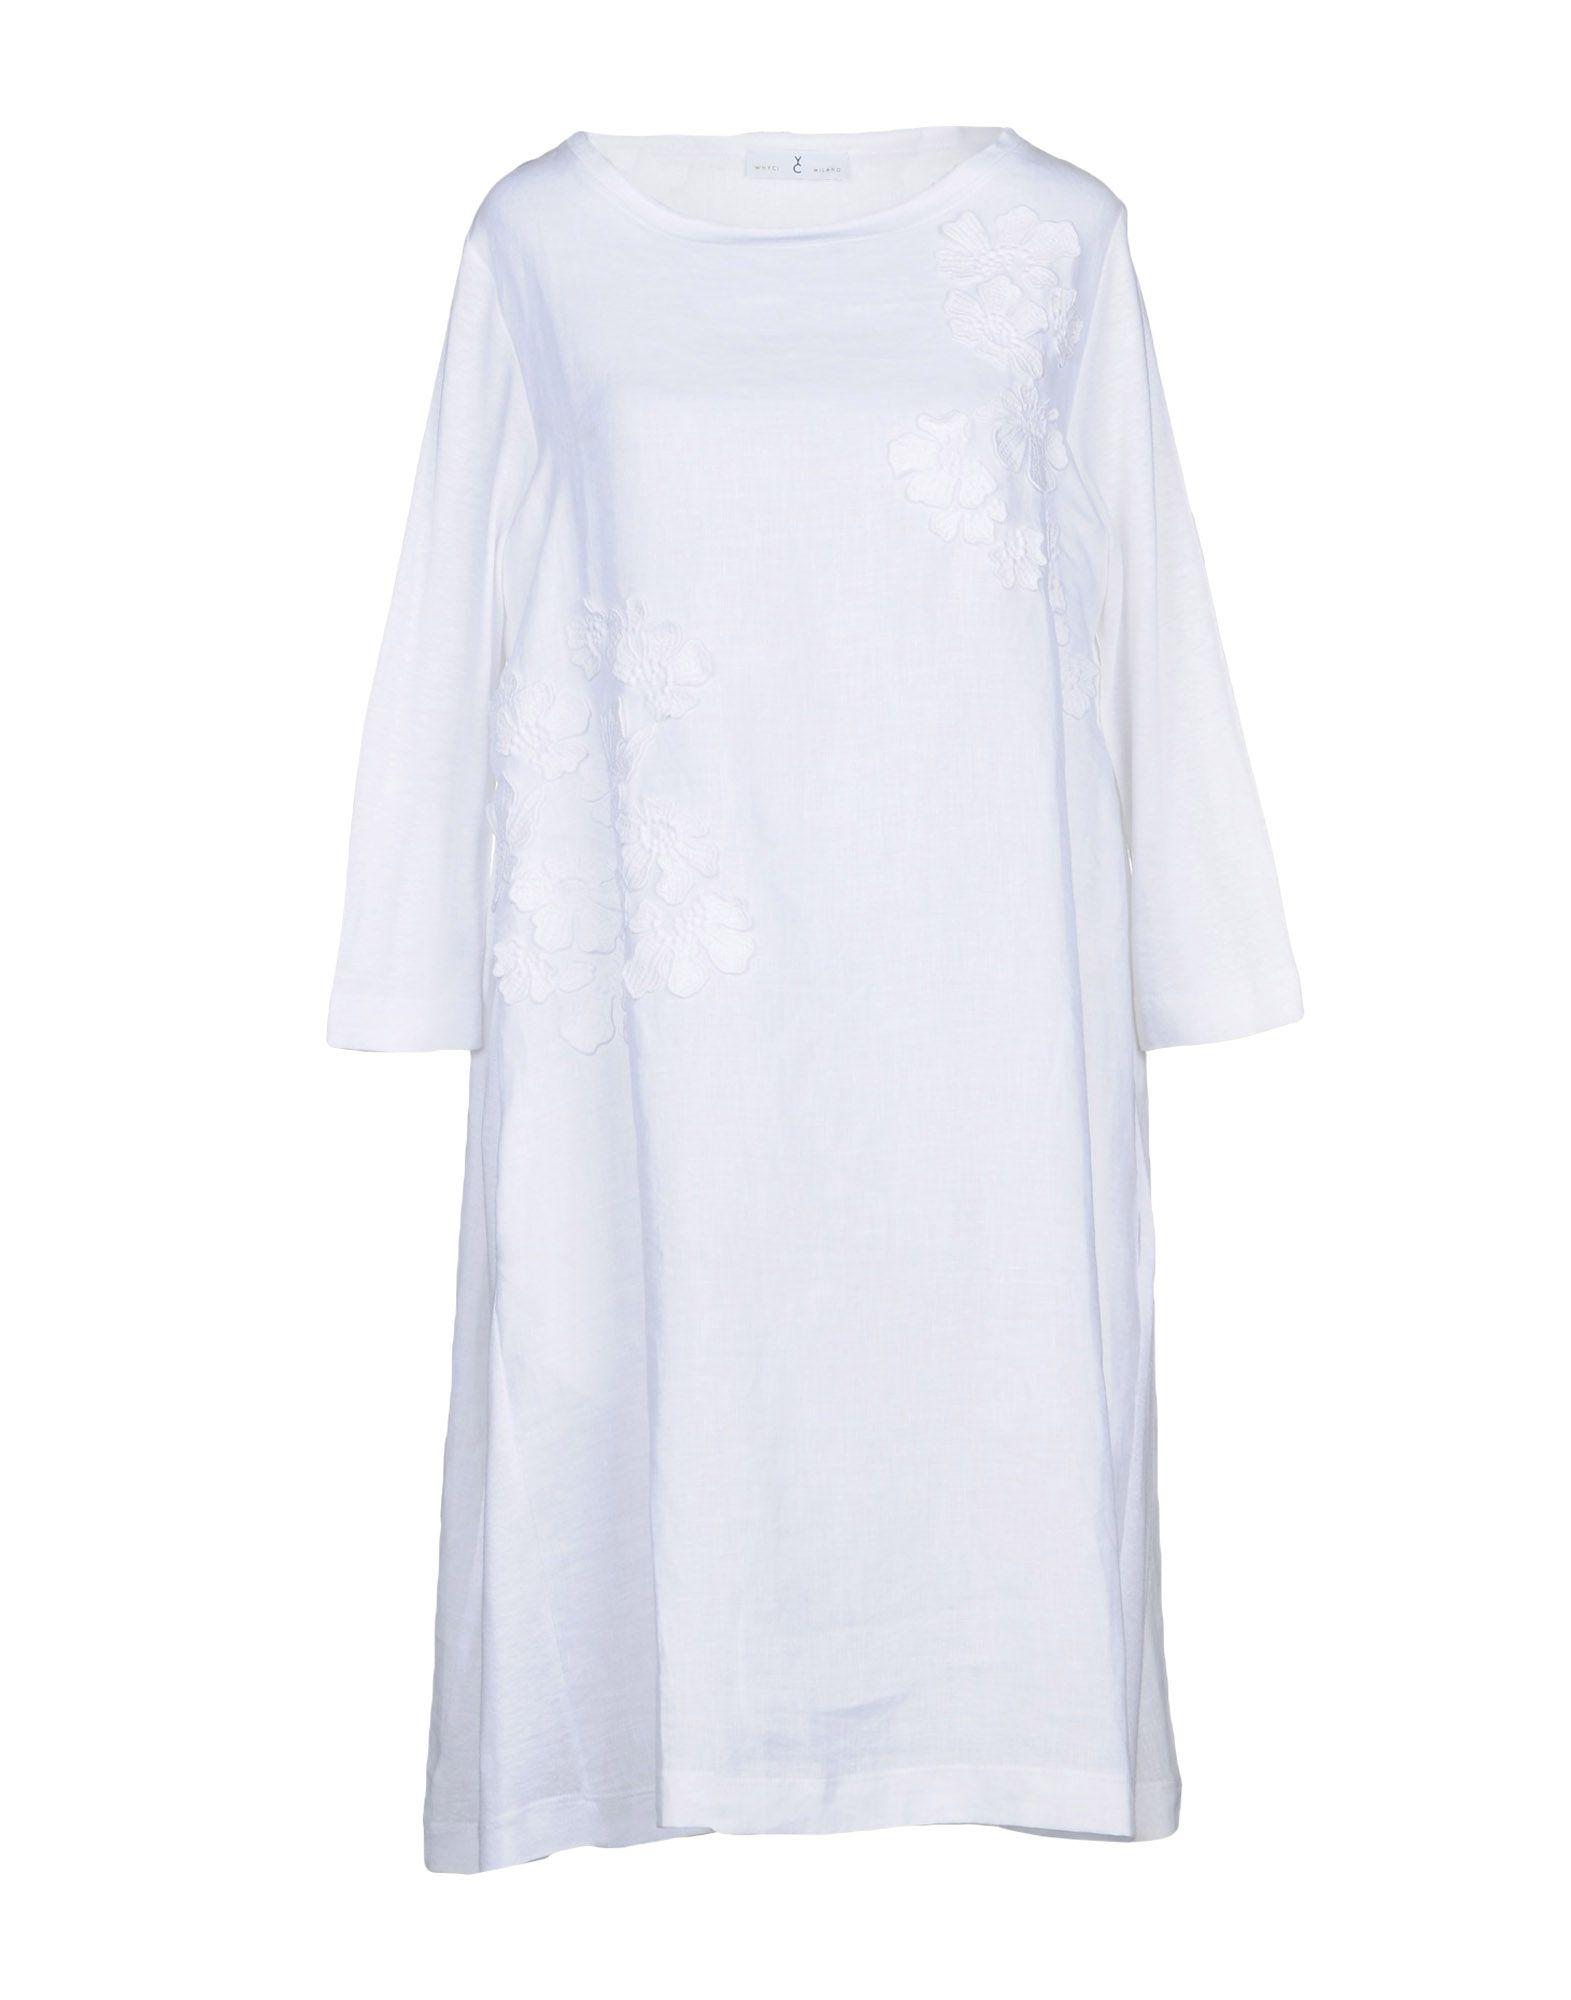 DRESSES - Short dresses Whyci QOipj1YTo